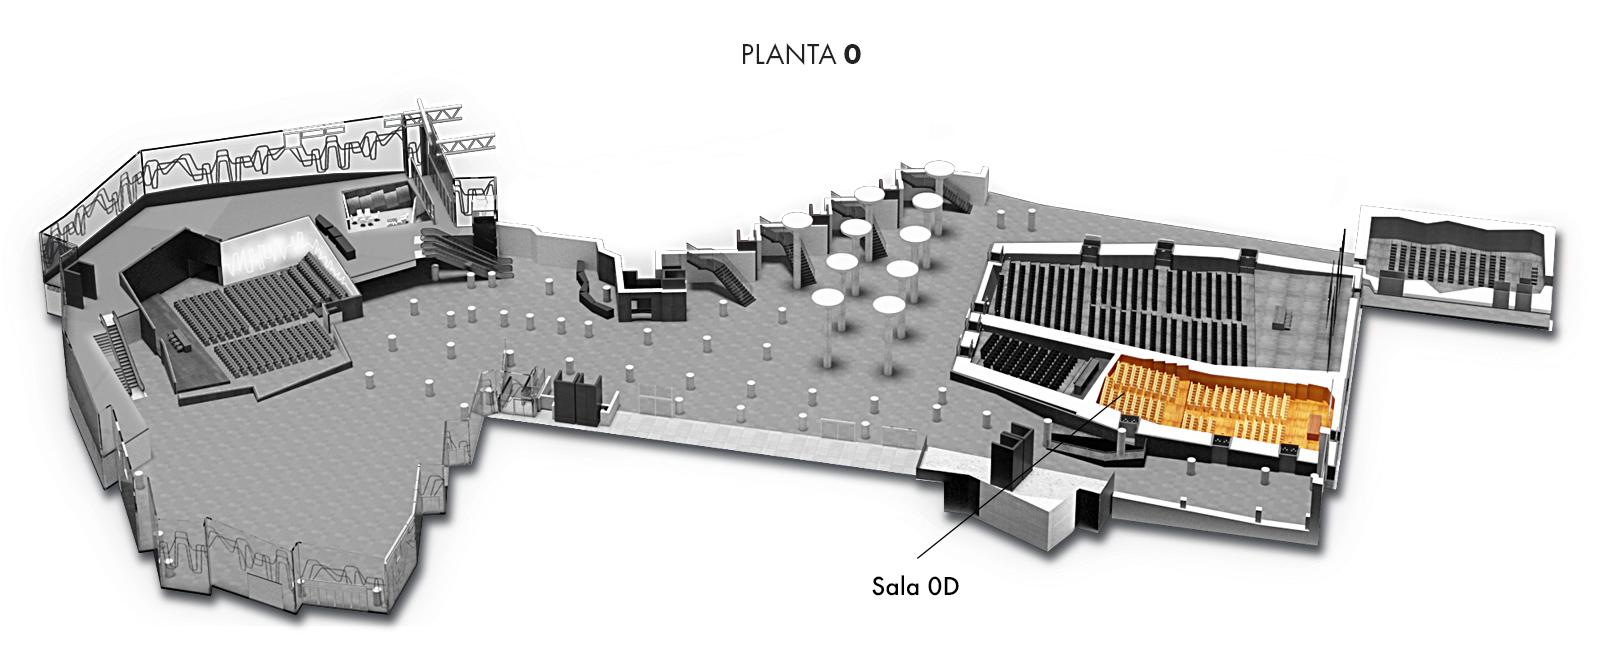 Sala 0D, Planta 0   Palacio Euskalduna Jauregia